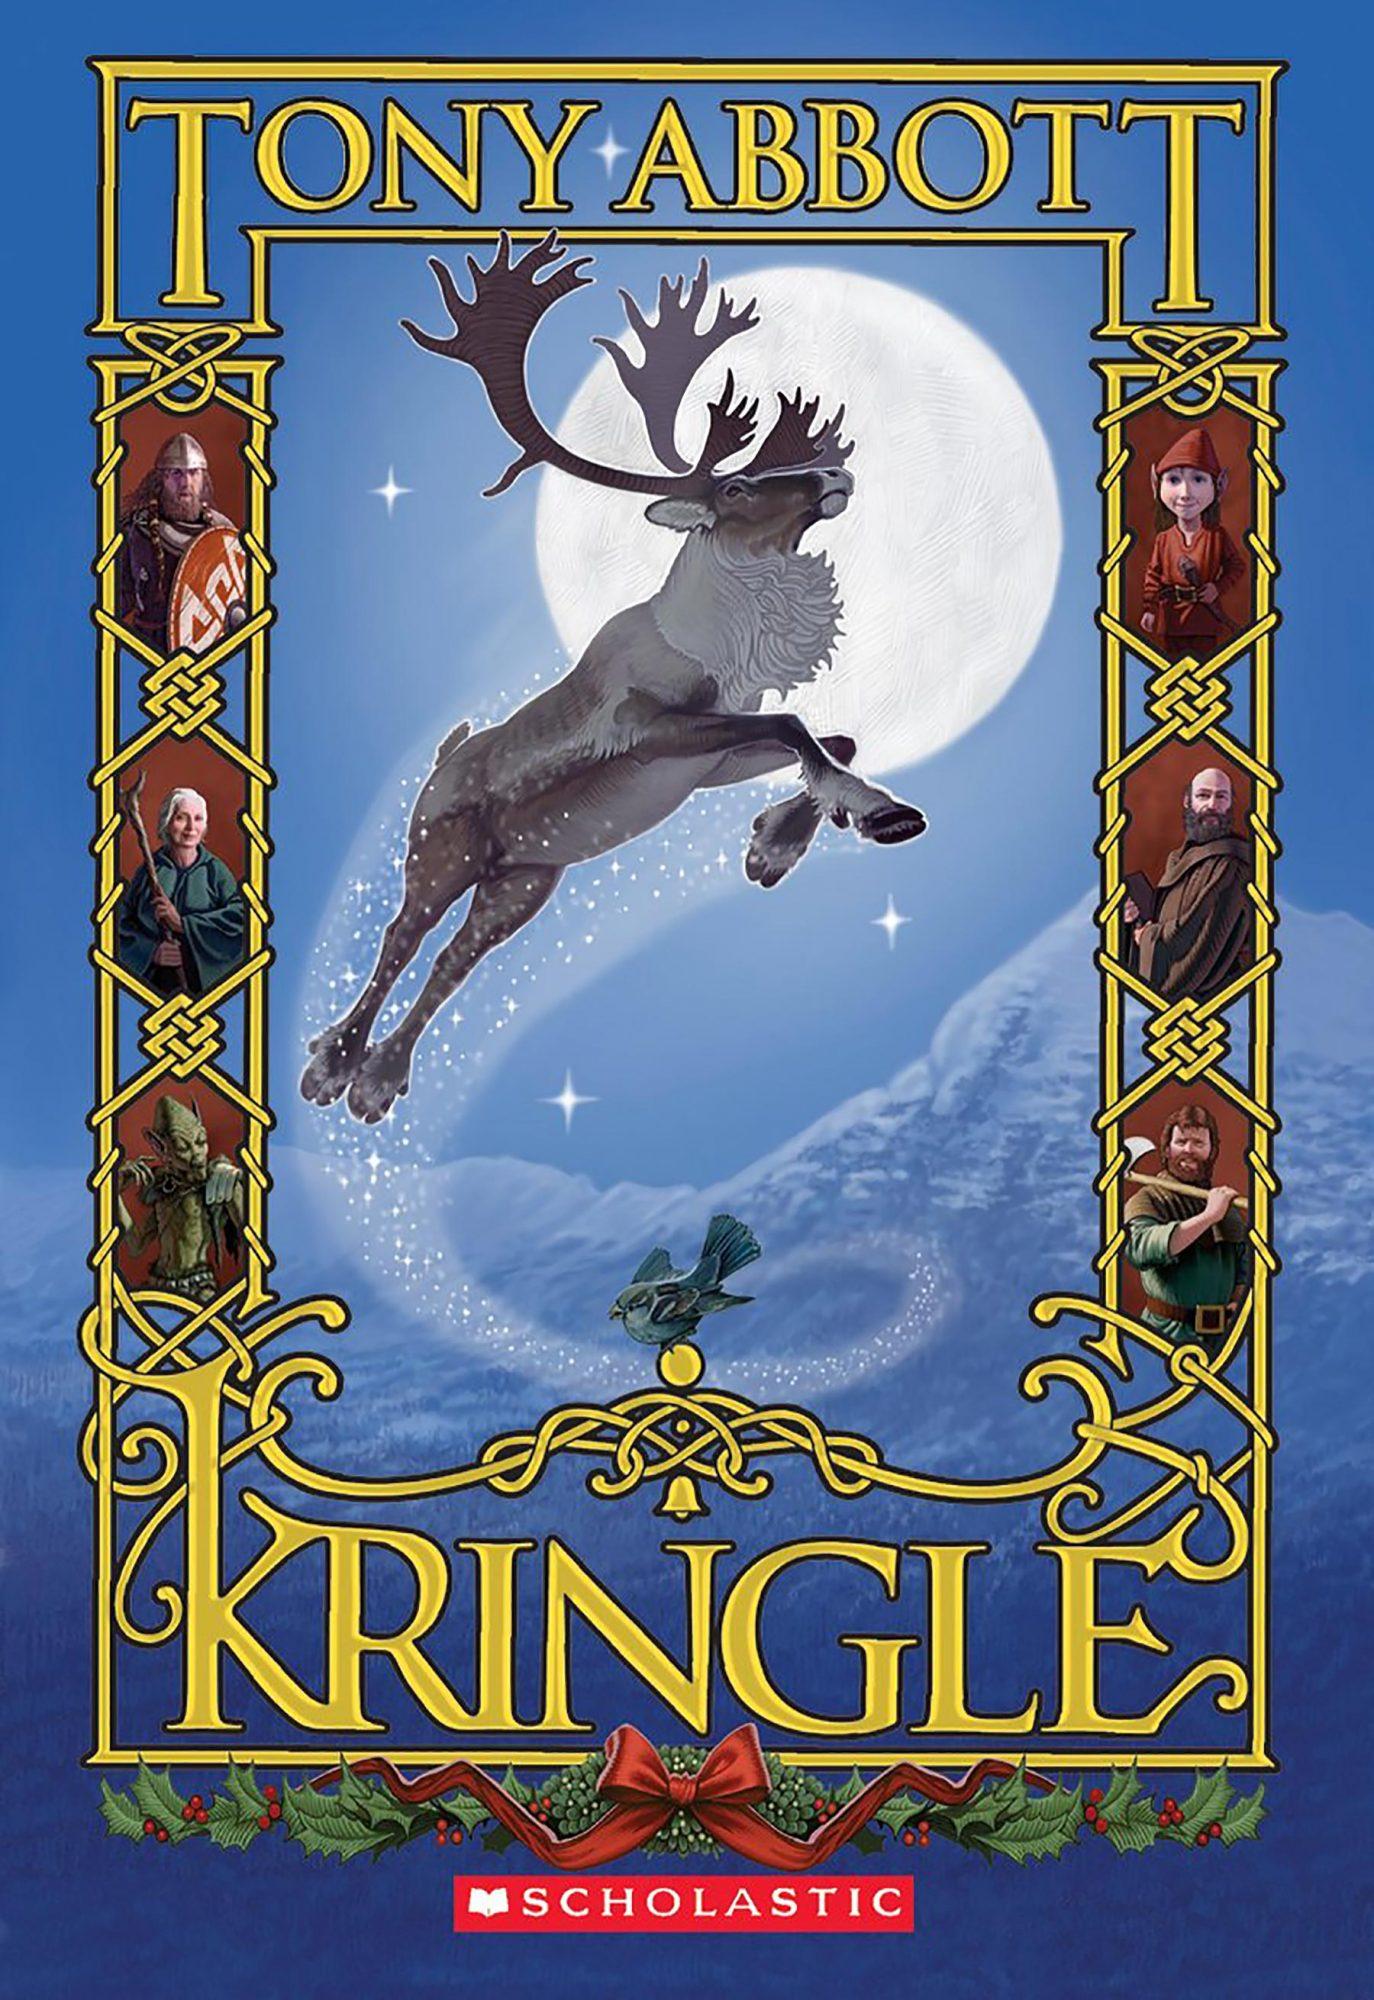 Kringle by Tony AbbottCR: Scholastic